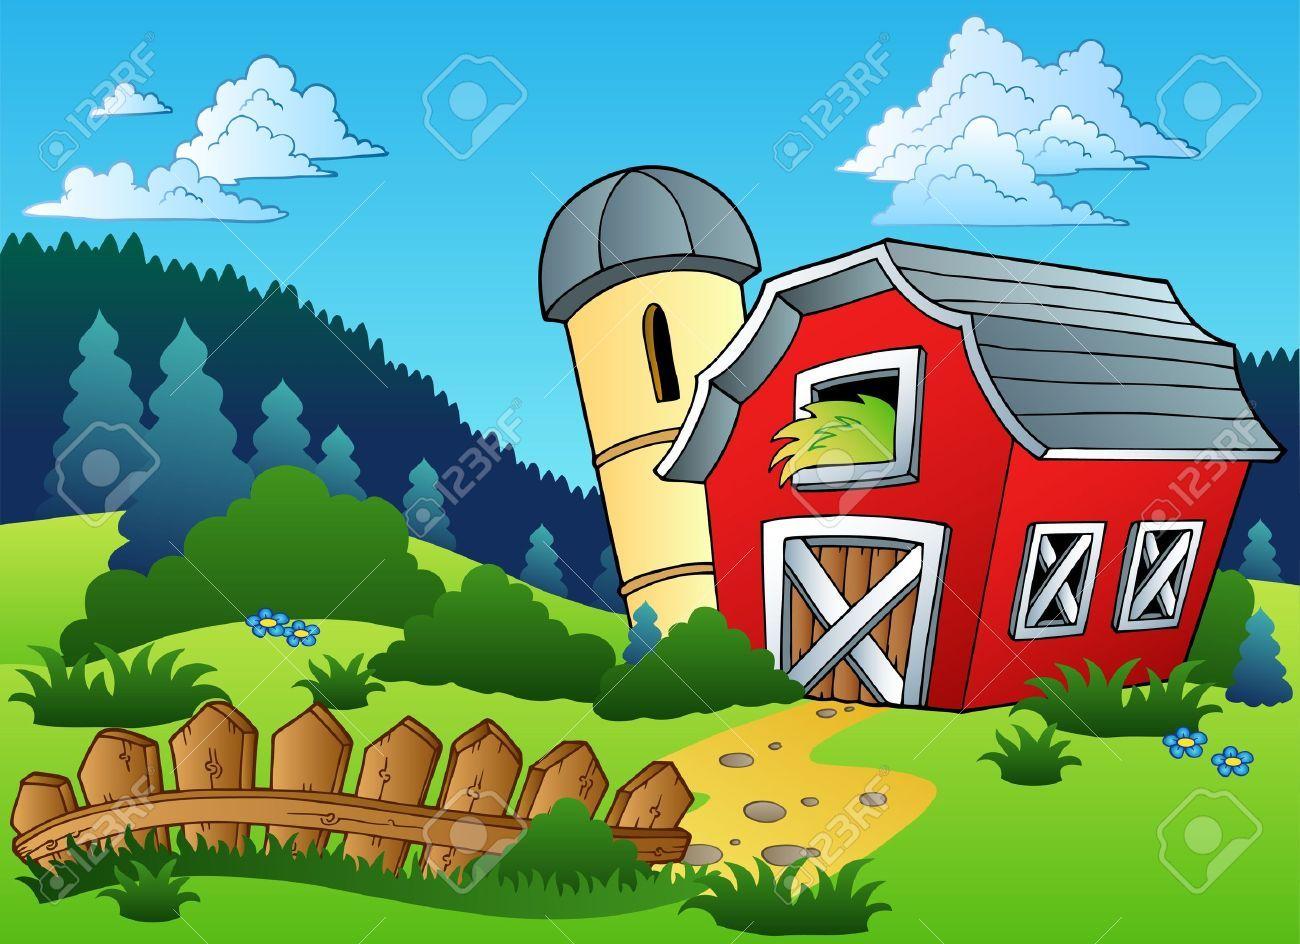 Farm scene clipart image library library Resultado de imagen para farm scene wallpaper FOR KIDS | Painting ... image library library